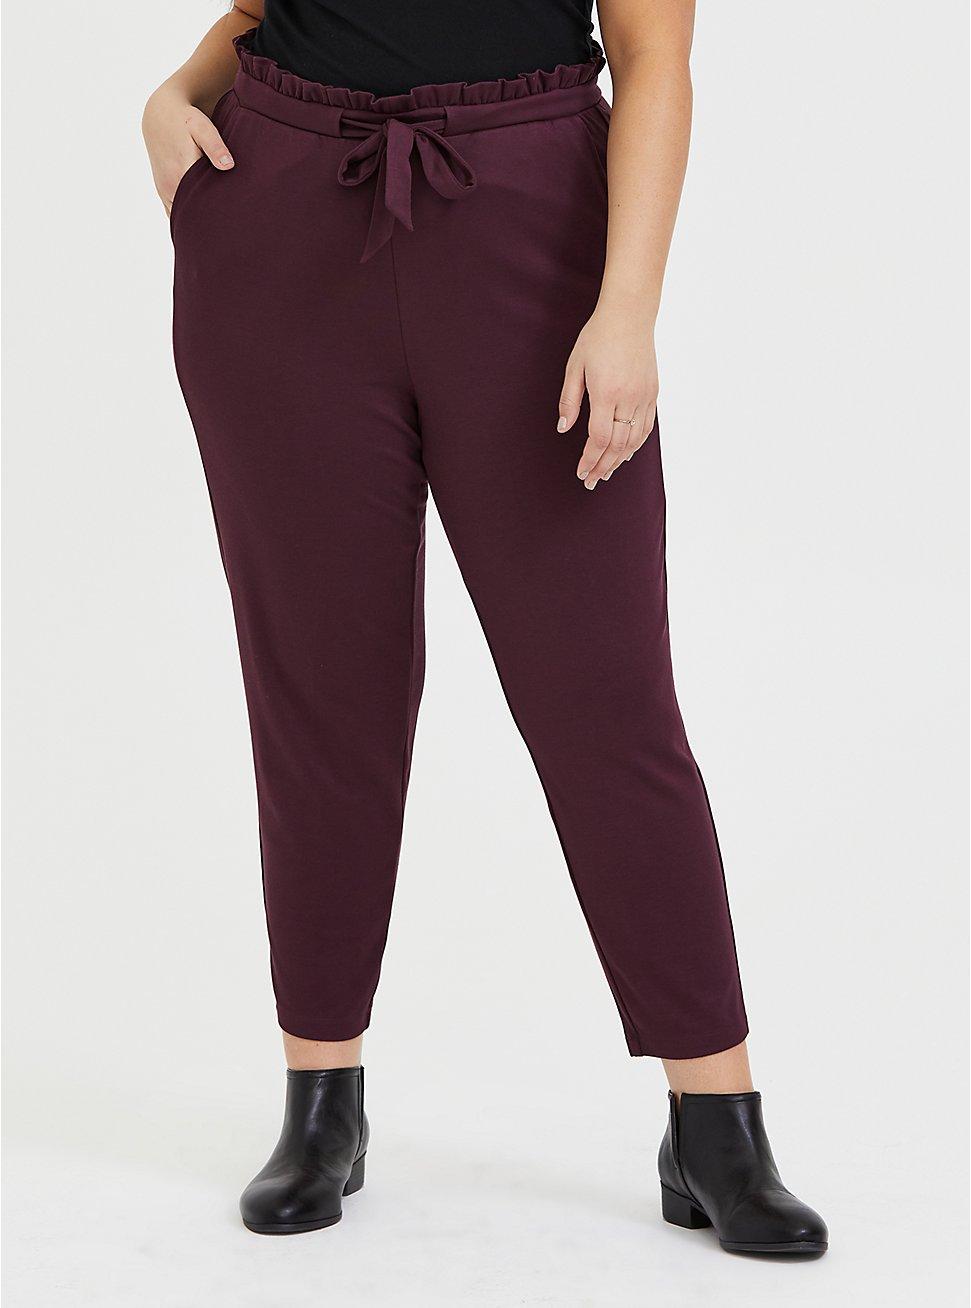 Burgundy Purple Ponte Paperbag Waist Tapered Pant, WINETASTING, hi-res